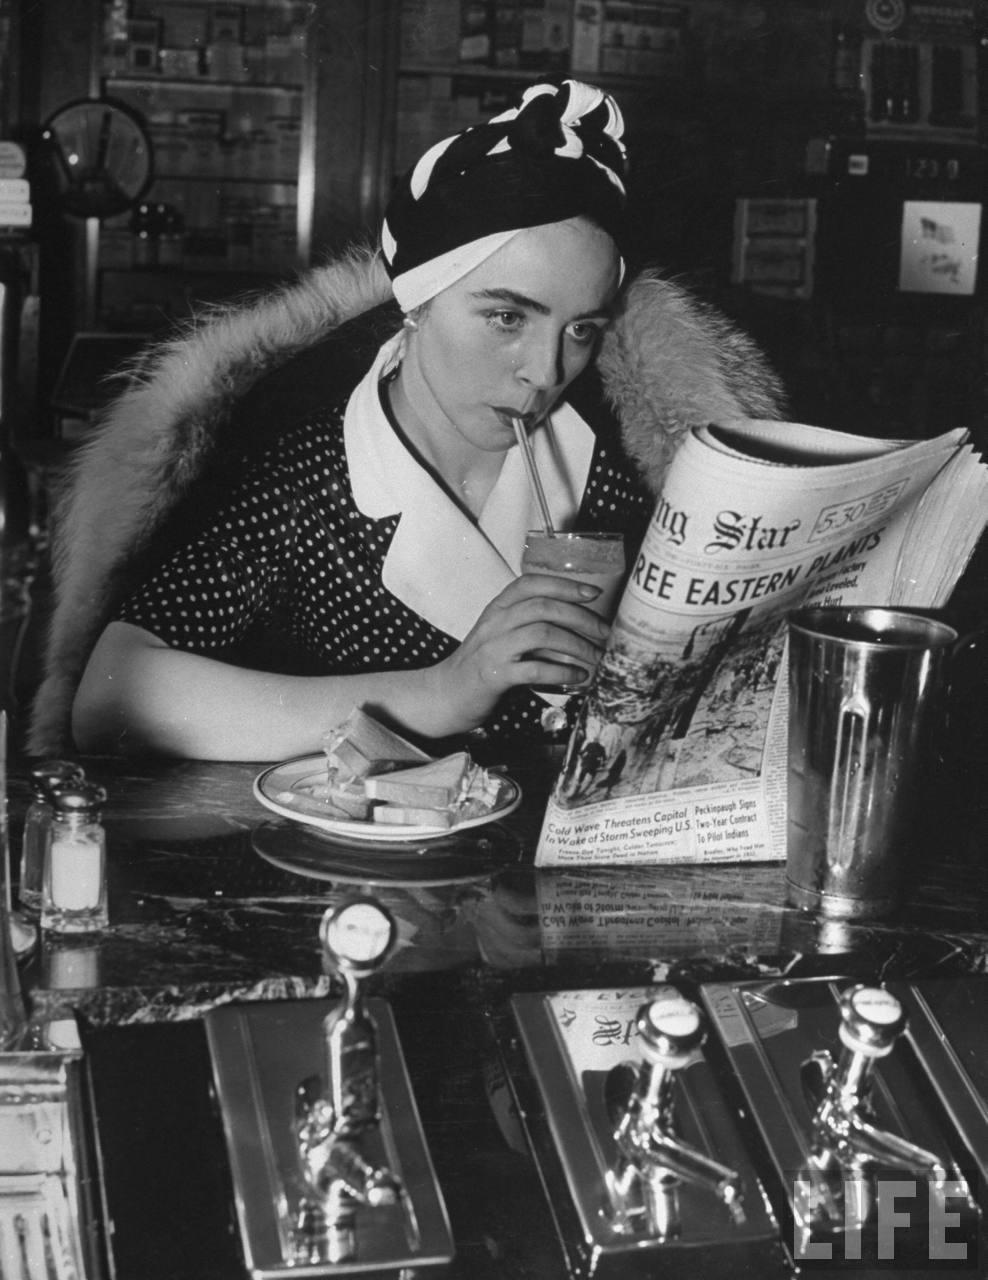 WomanReadingNewspaperDrinkingChocolateShakeWearingTurban1940